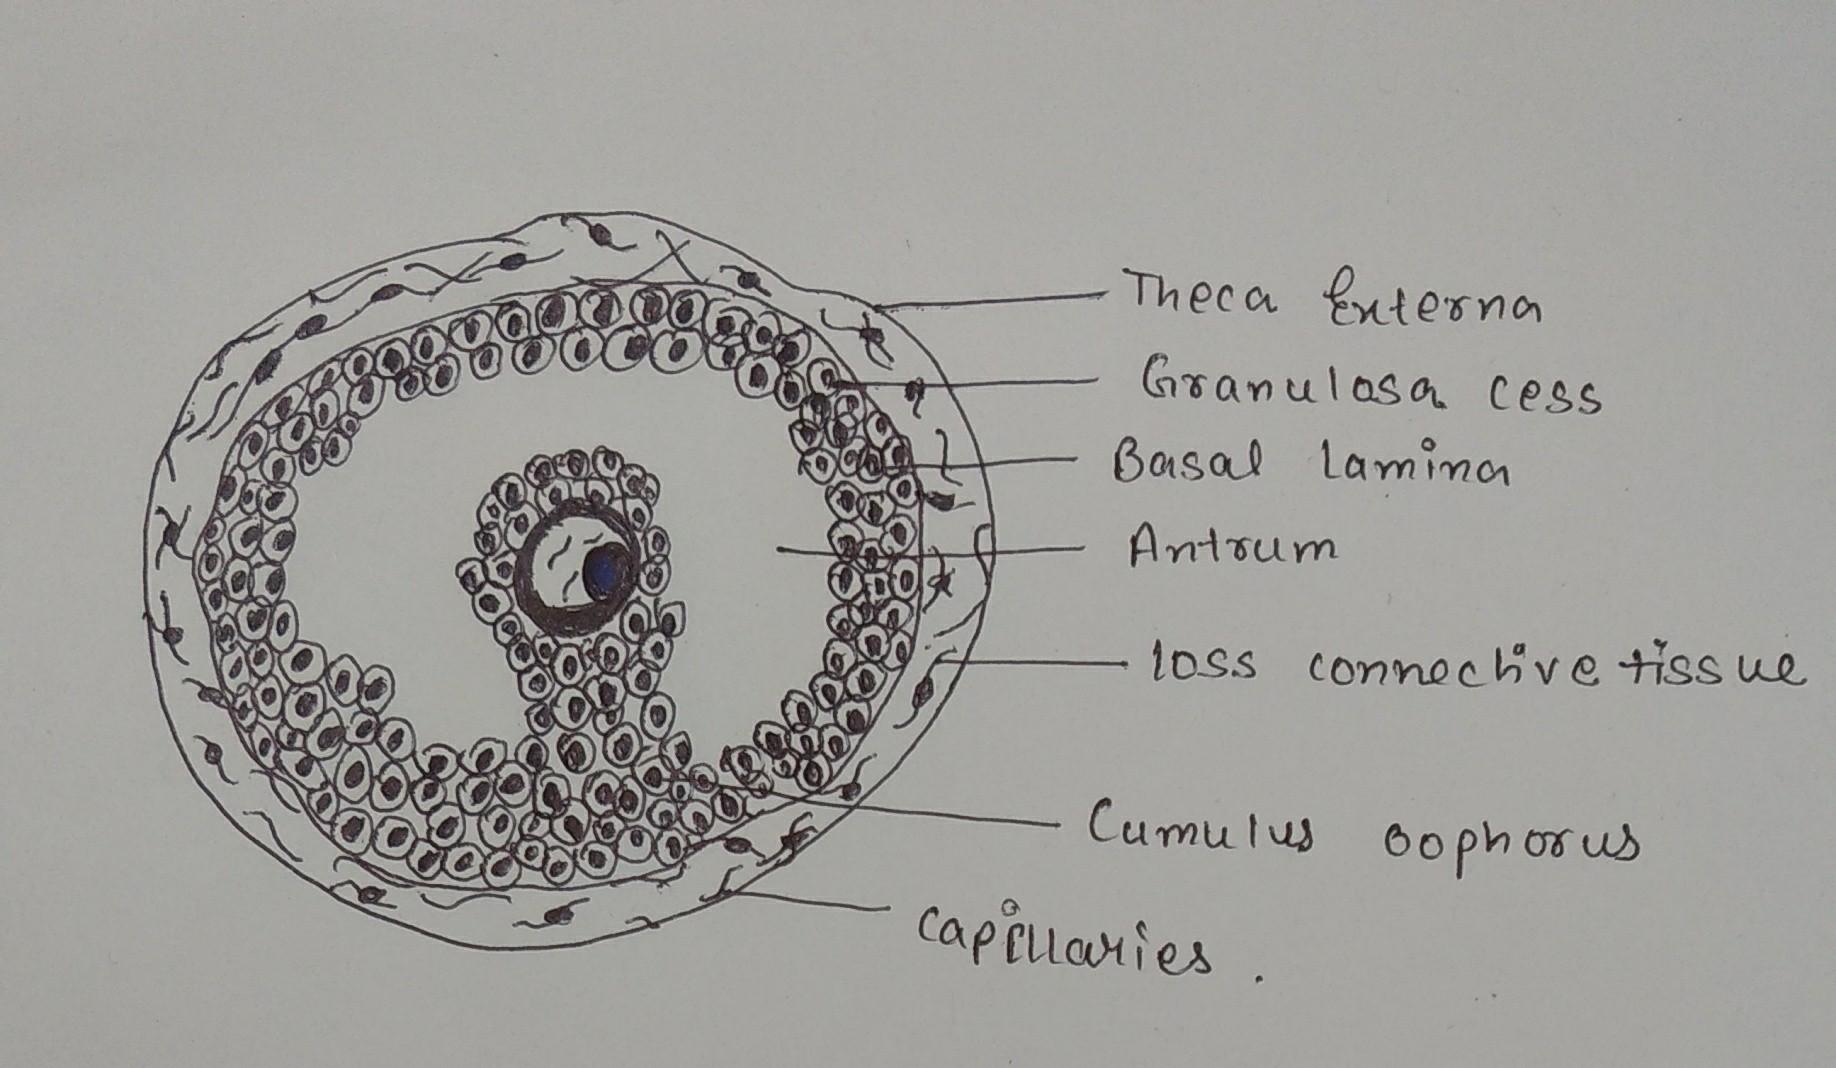 Draw A Labeled Diagram Of A Graafian Follicle